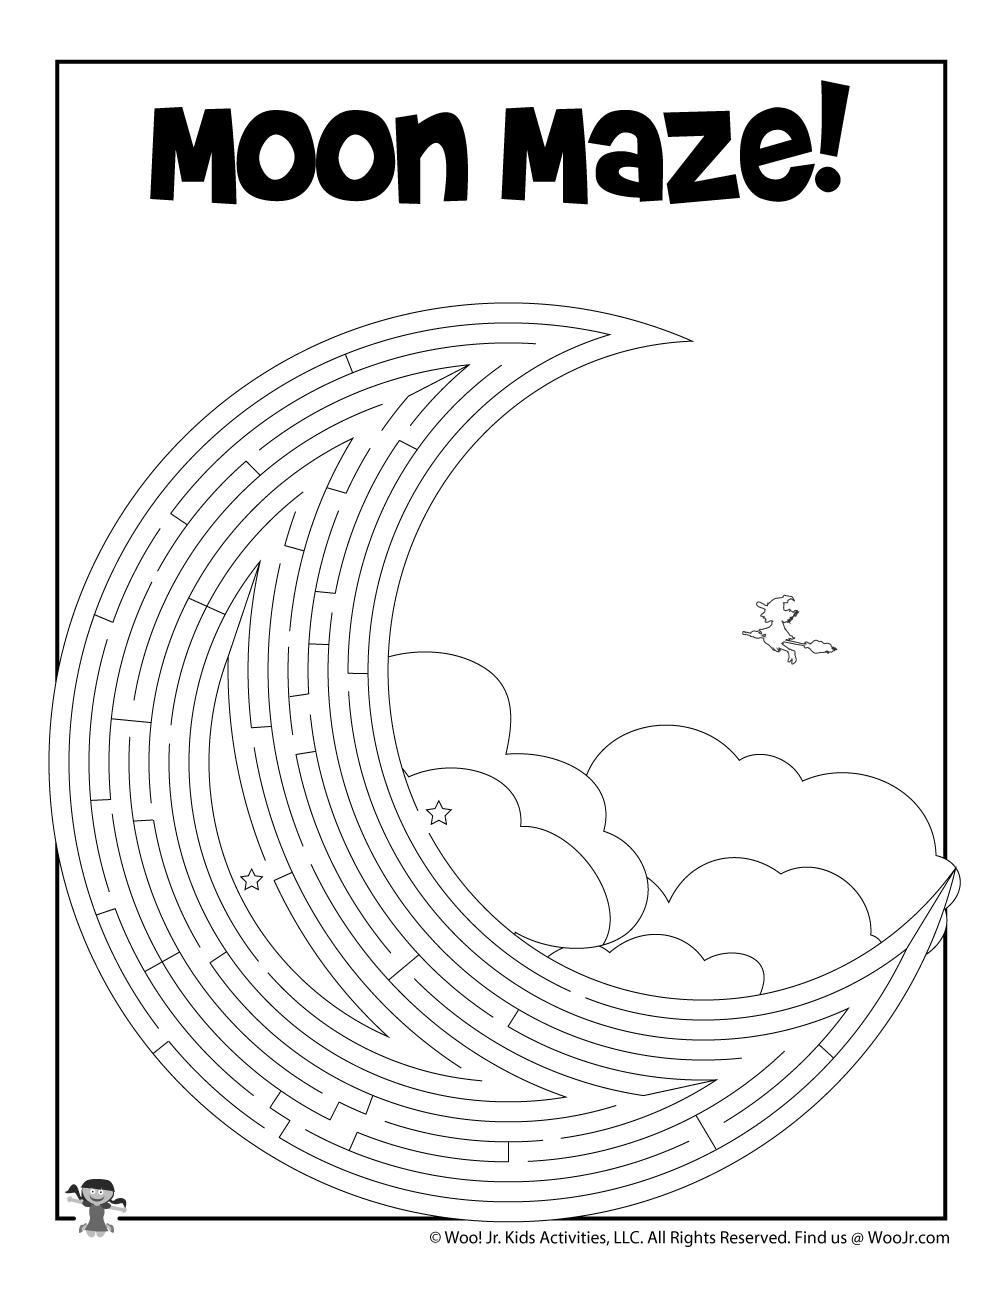 Moon Printable Maze Worksheet | Woo! Jr. Kids Activities